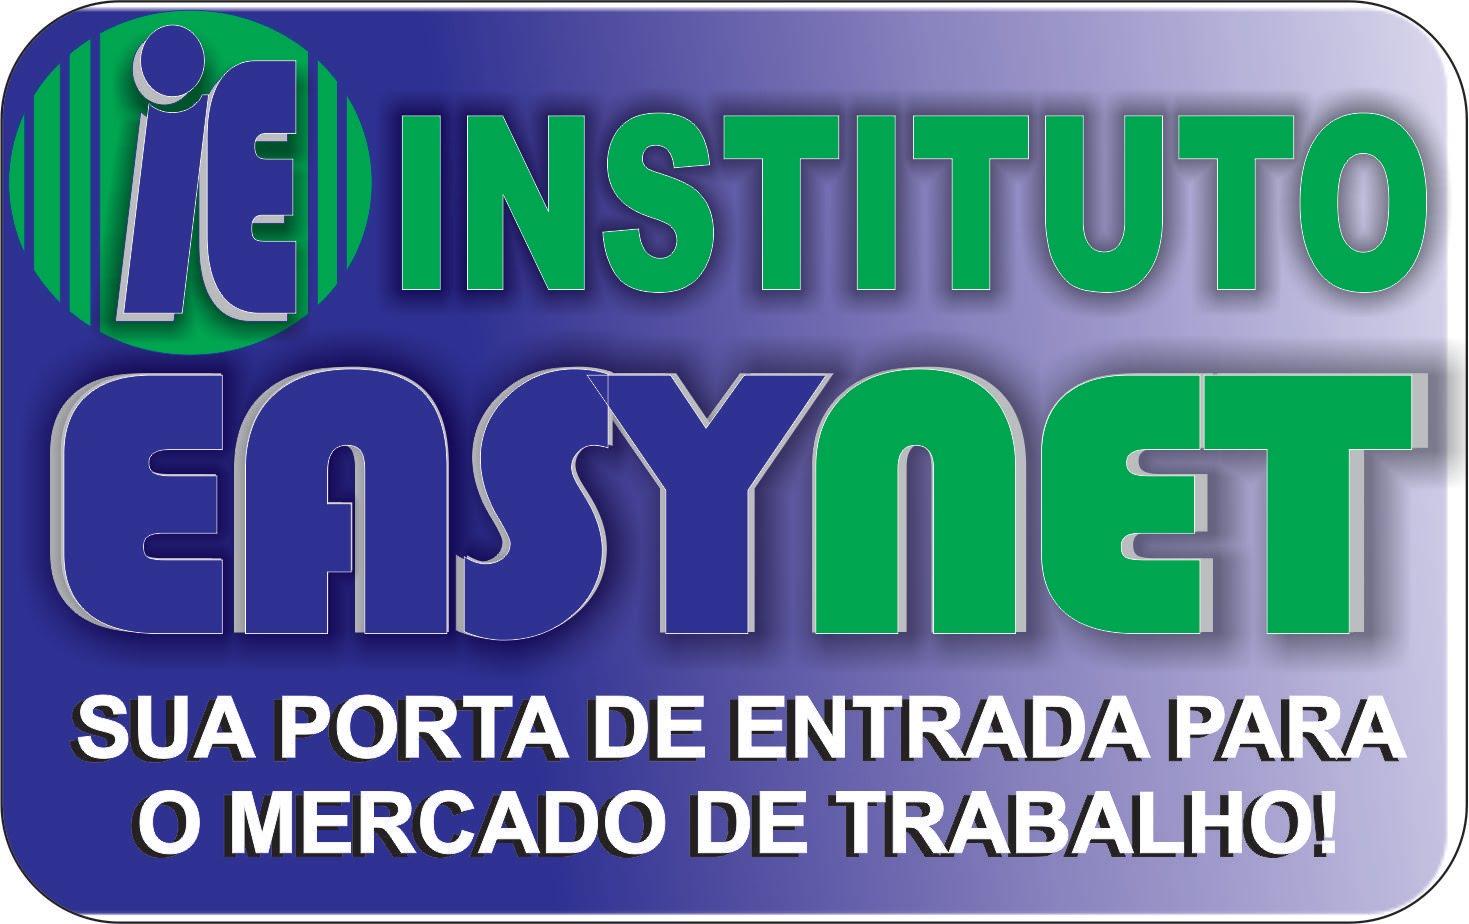 Instituto EasyNet